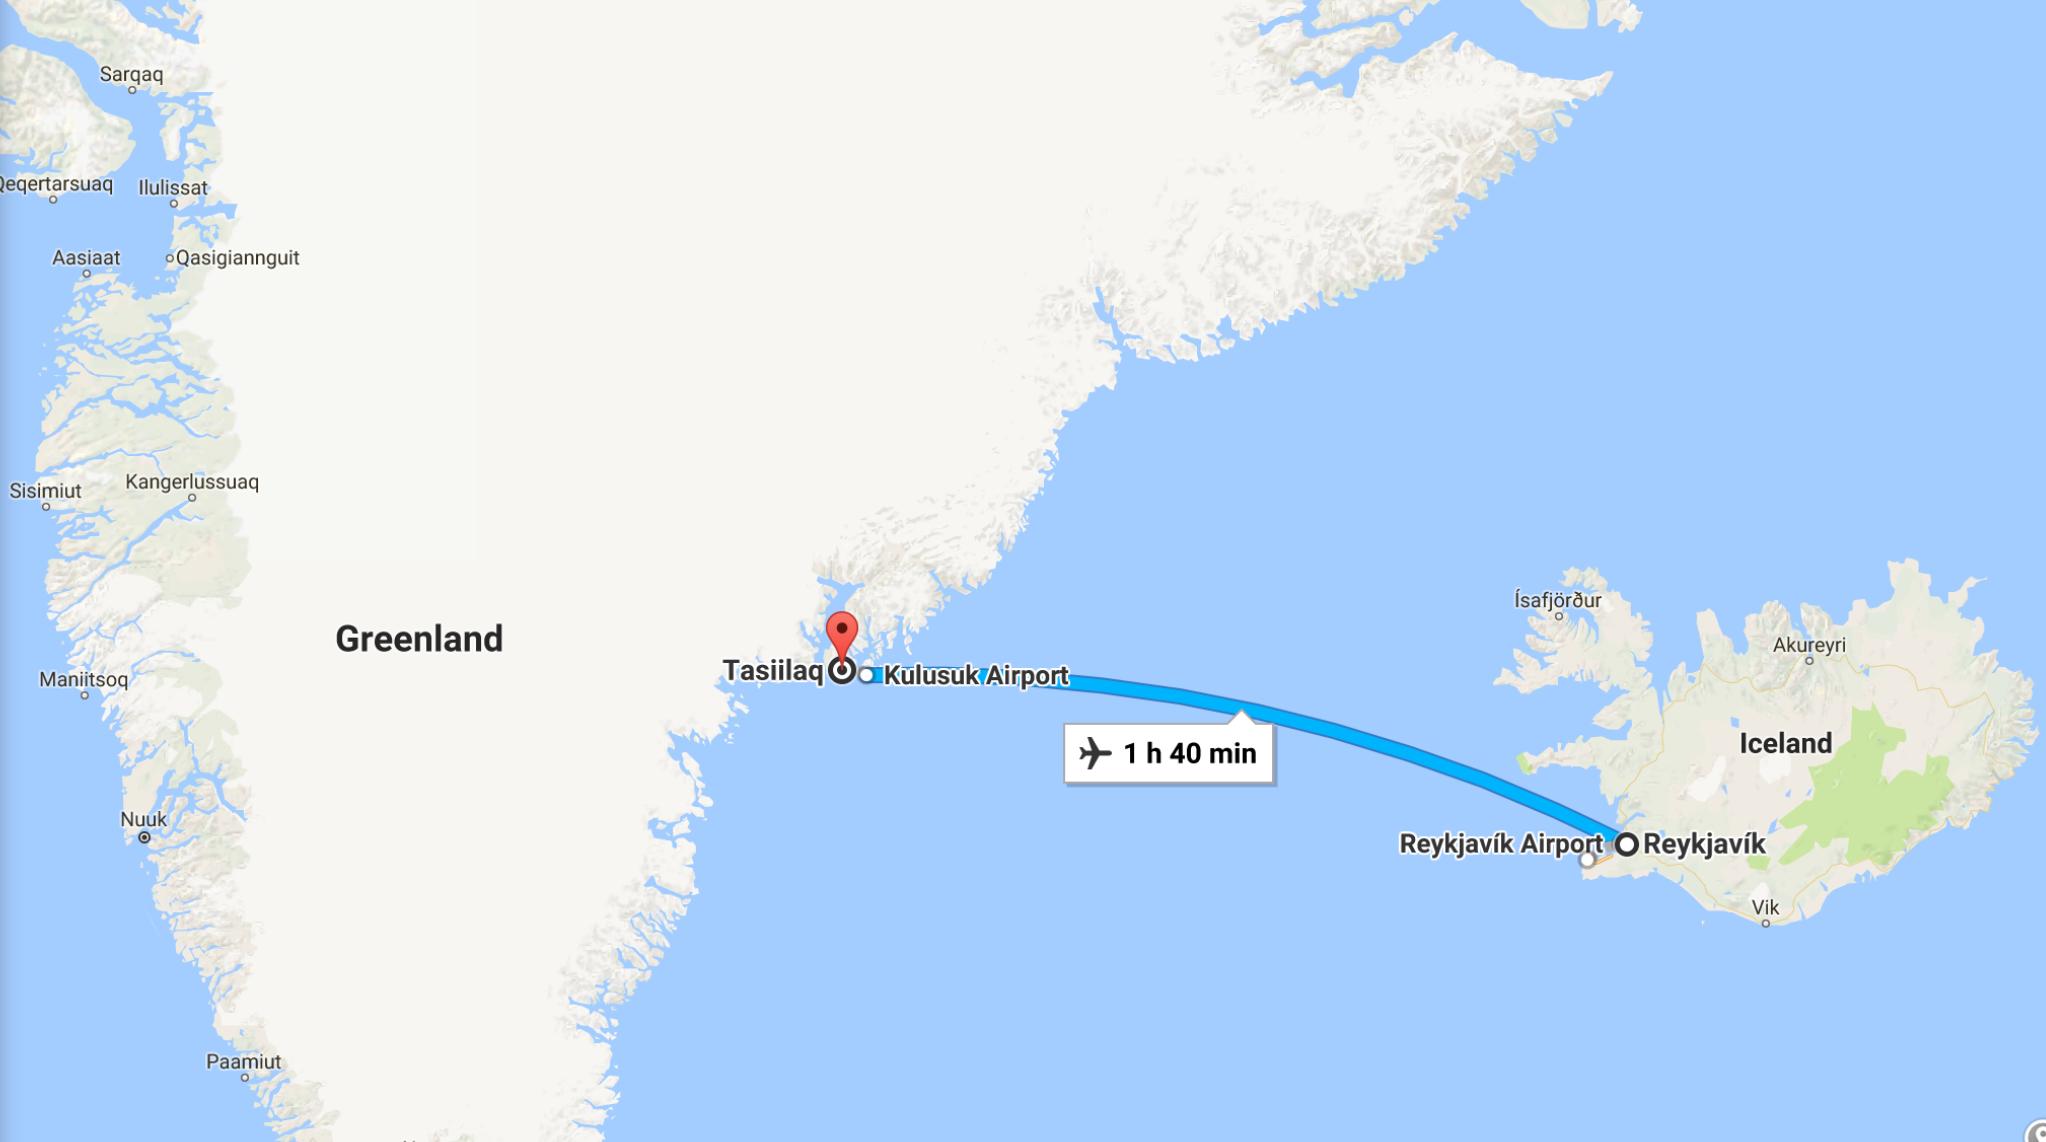 Iceland-Greenland.png#asset:7927:url